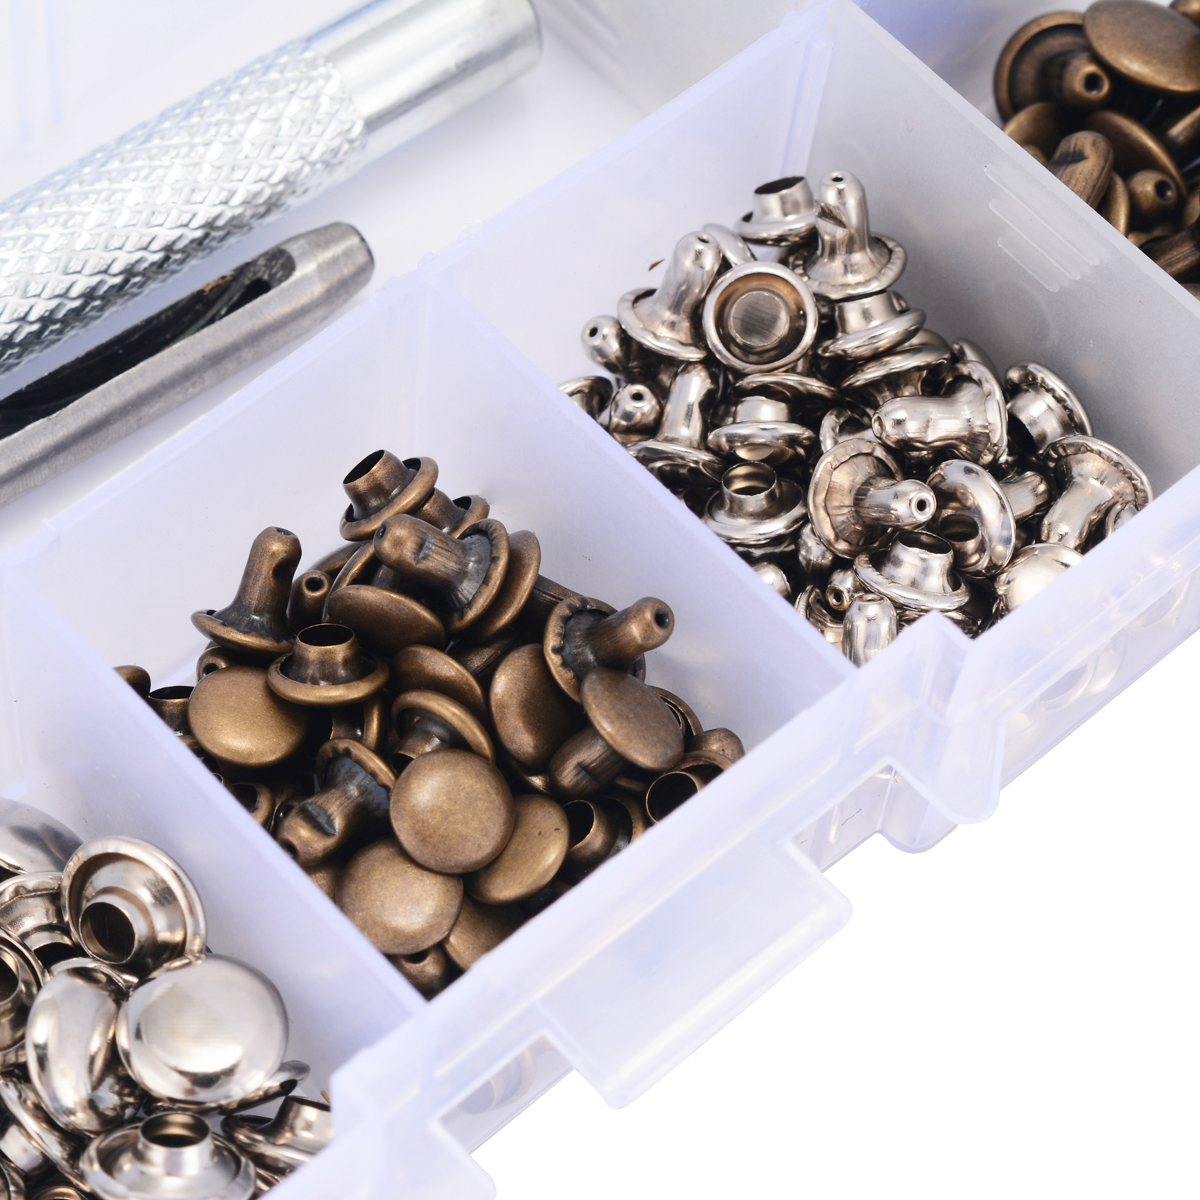 120pcs Double-sided Leather Decorative Rivets Tubular Metal Single Hollow Rivet Buckle + Fixing Repairing Tool Storage Box Kit